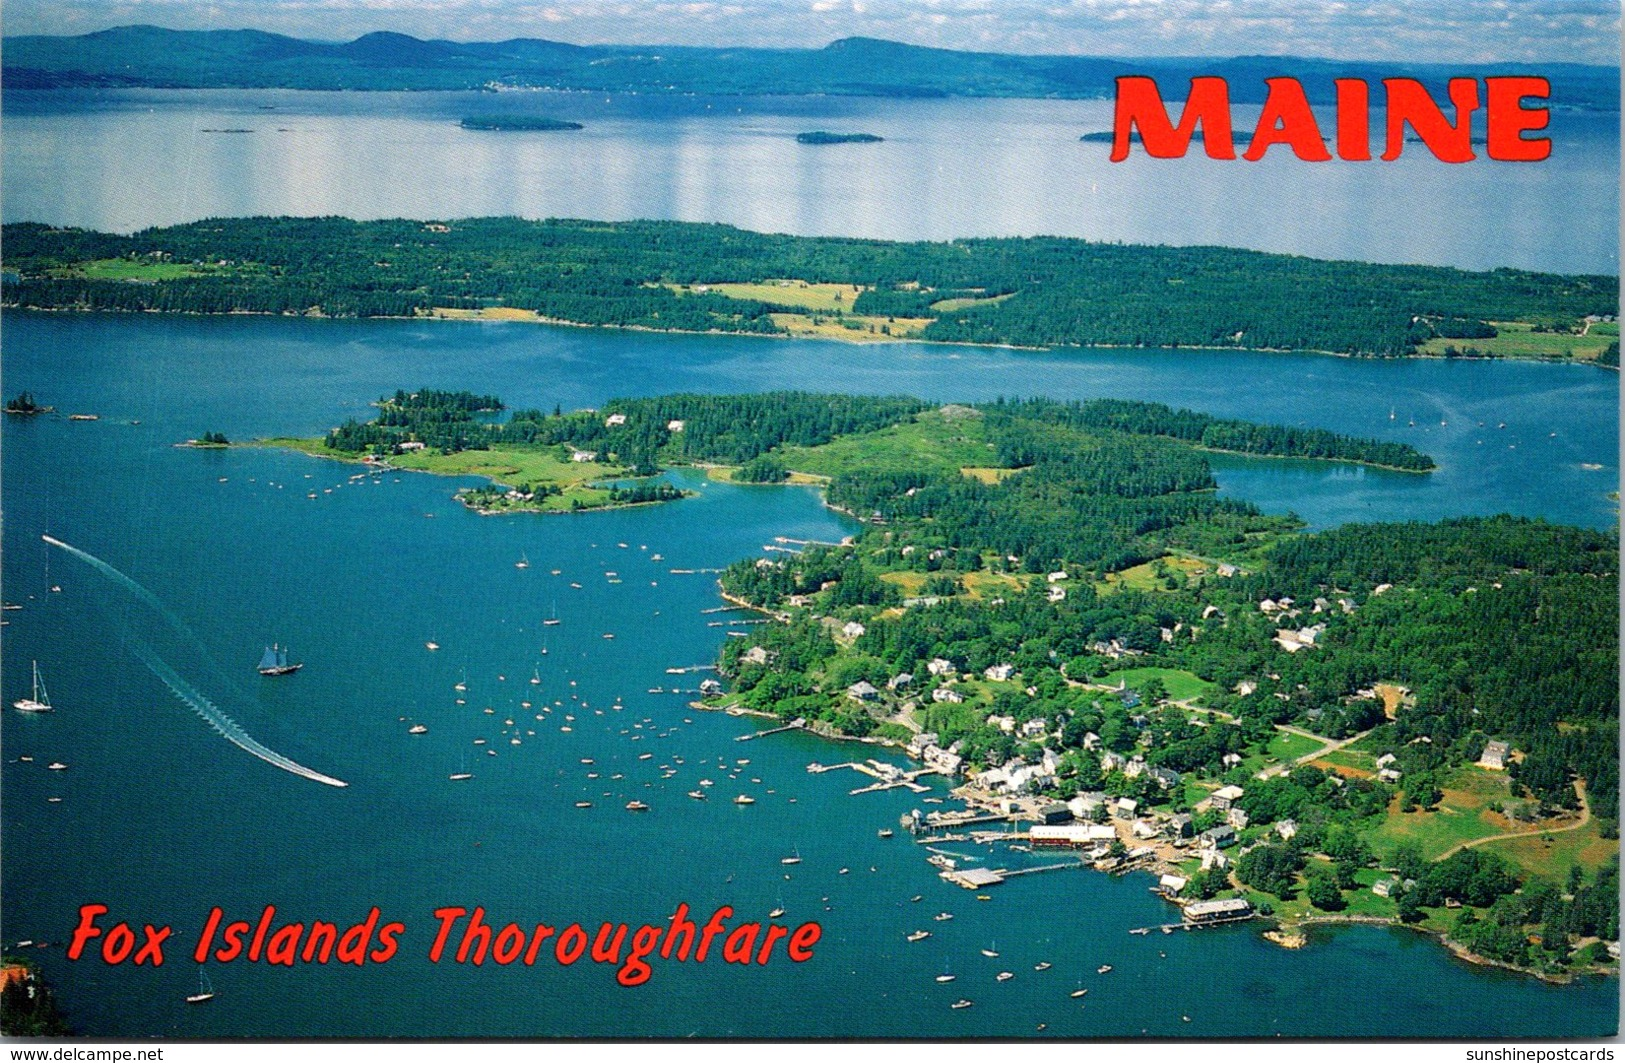 Maine Aerial View Fox Islands Thoroughfare